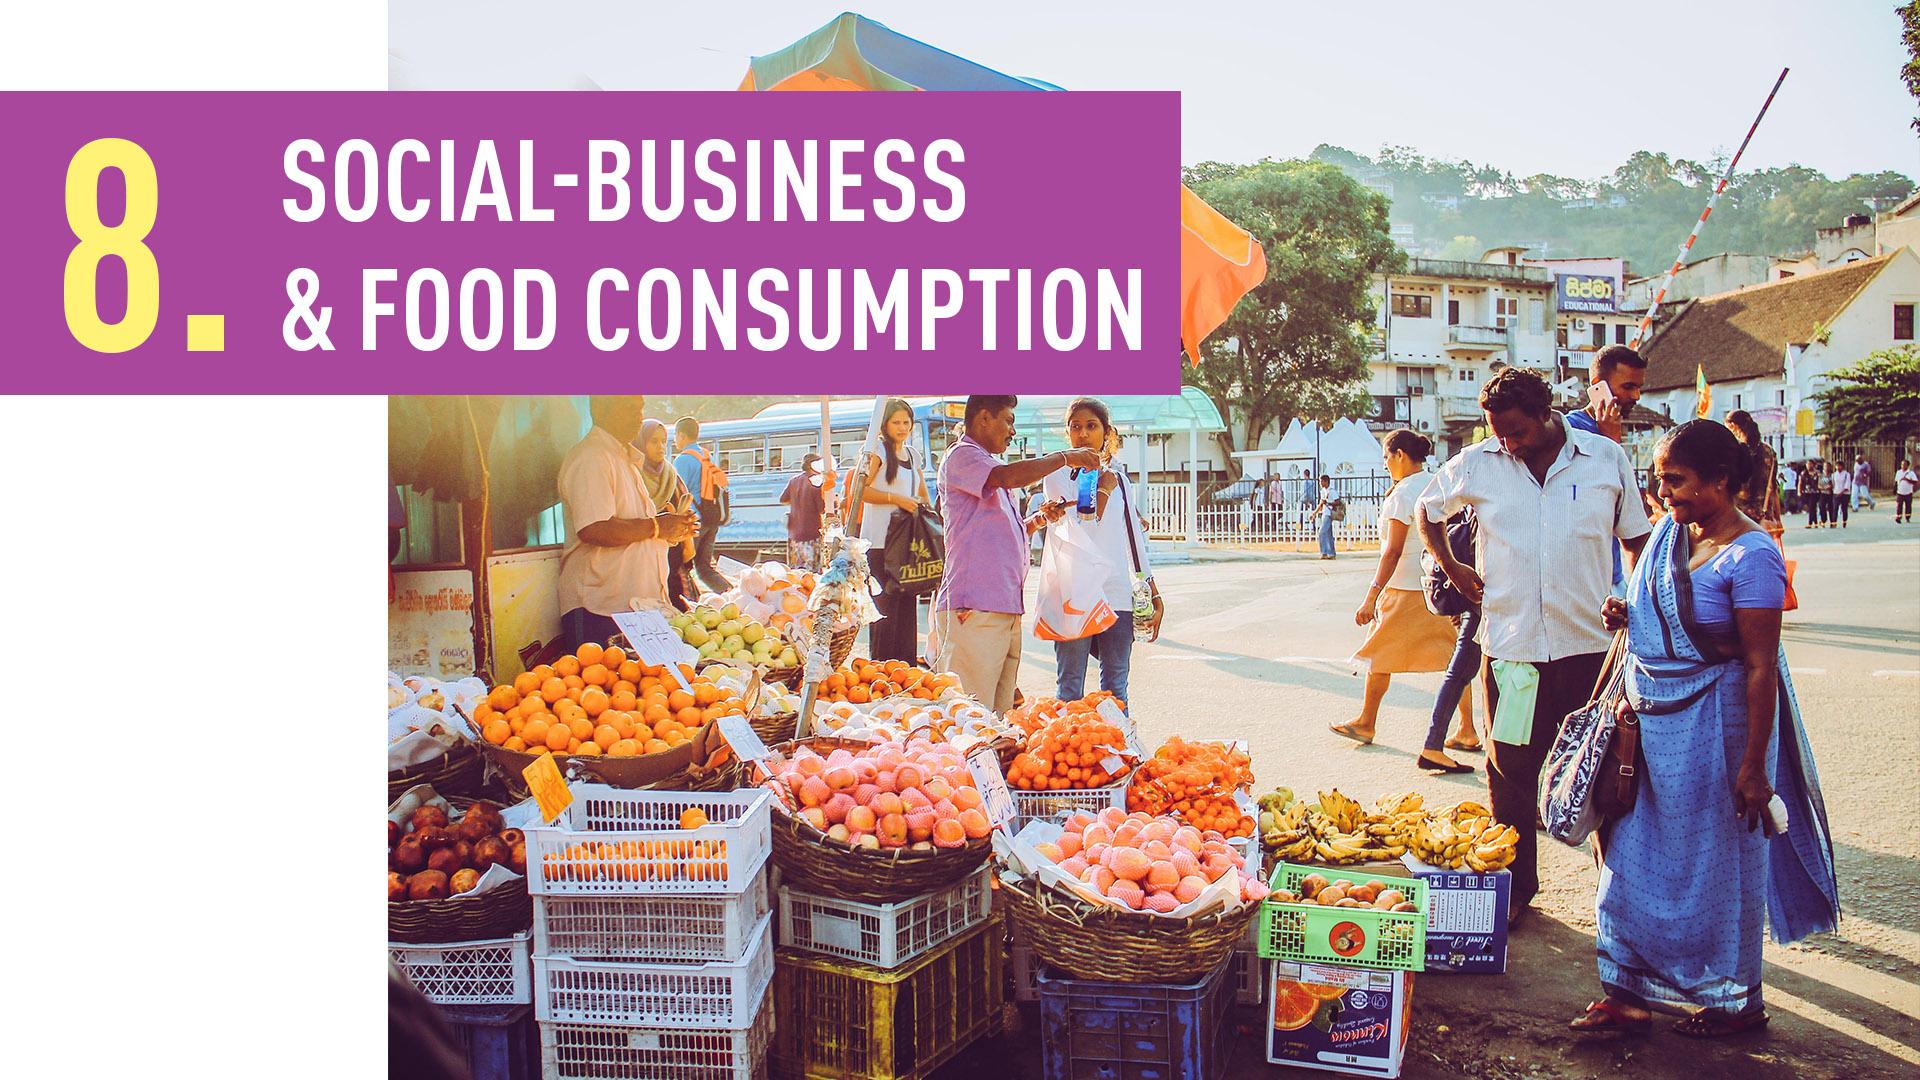 SOCIAL-BUSINESS & FOOD CONSUMPTION